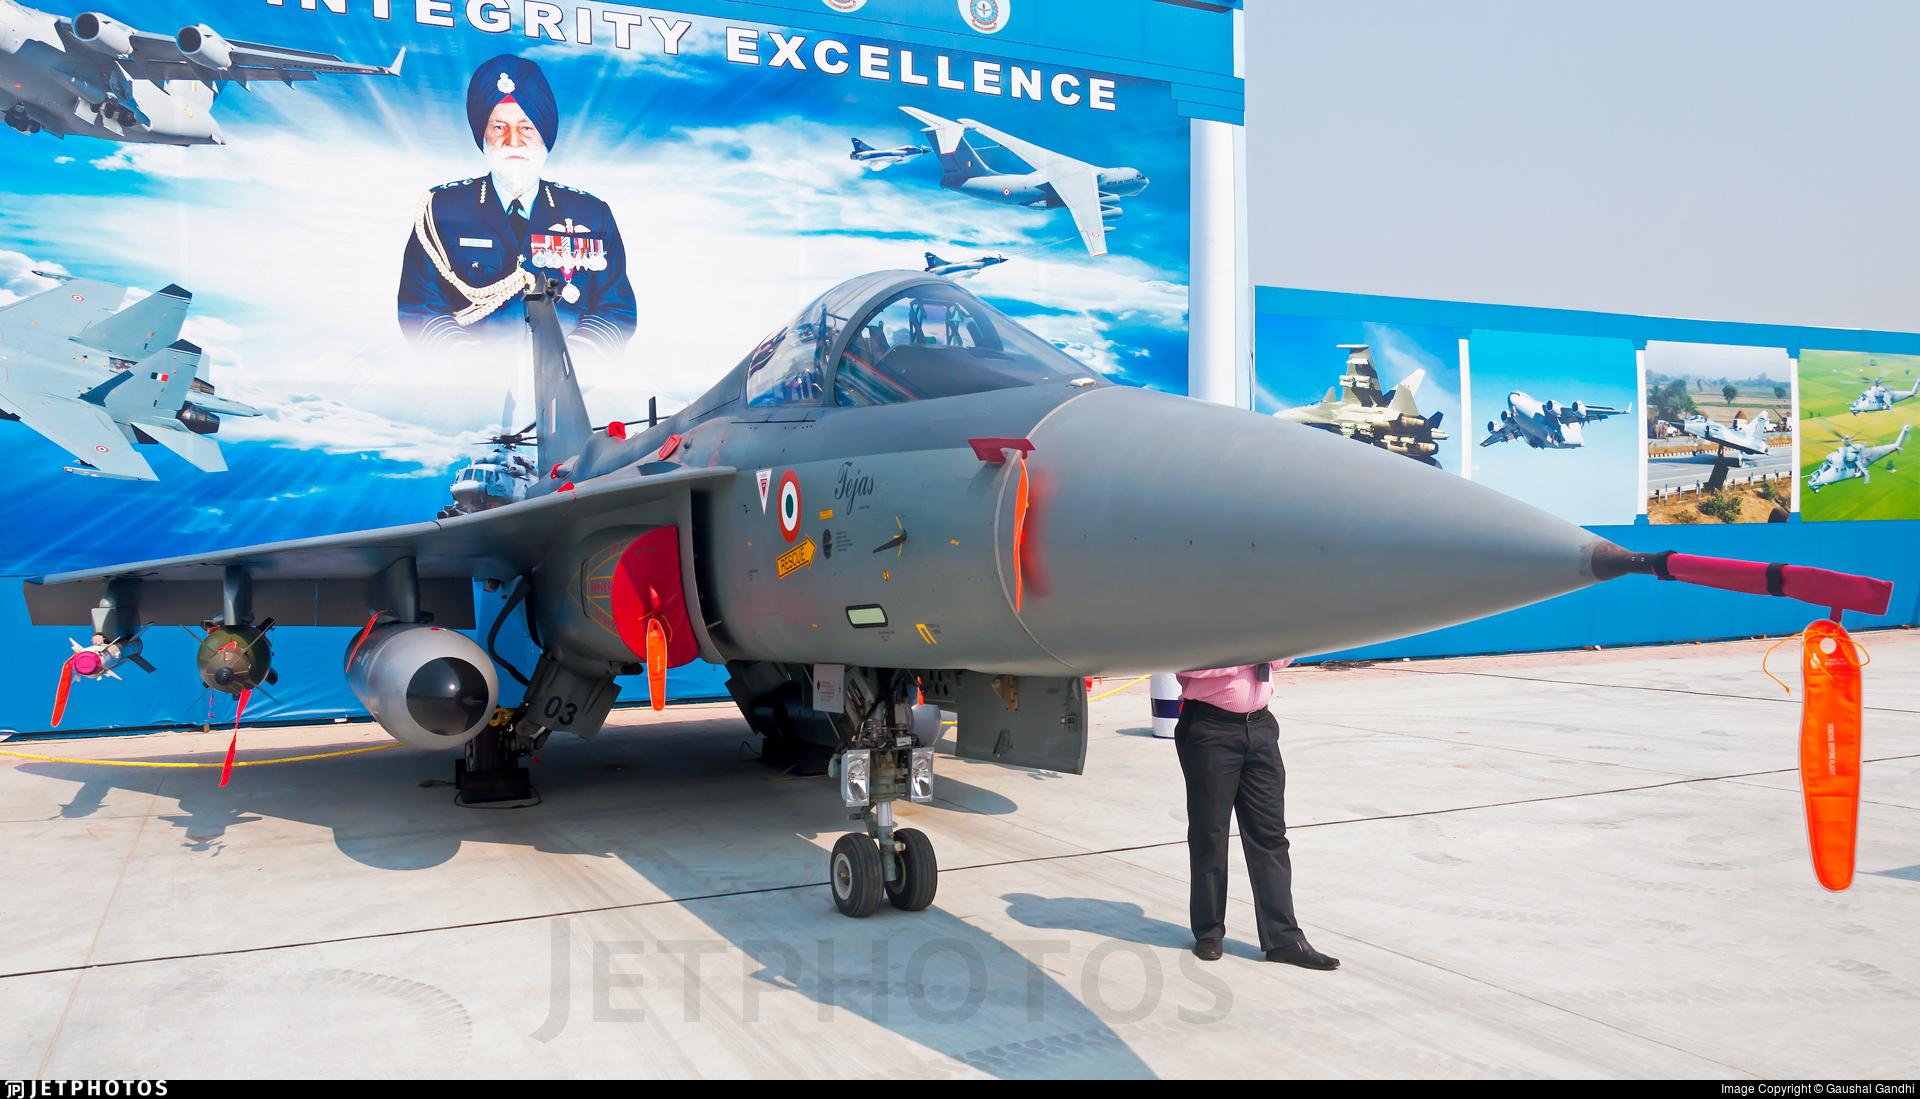 LA5003 - Hindustan Aeronautics LCA Tejas Mk.II - India - Air Force